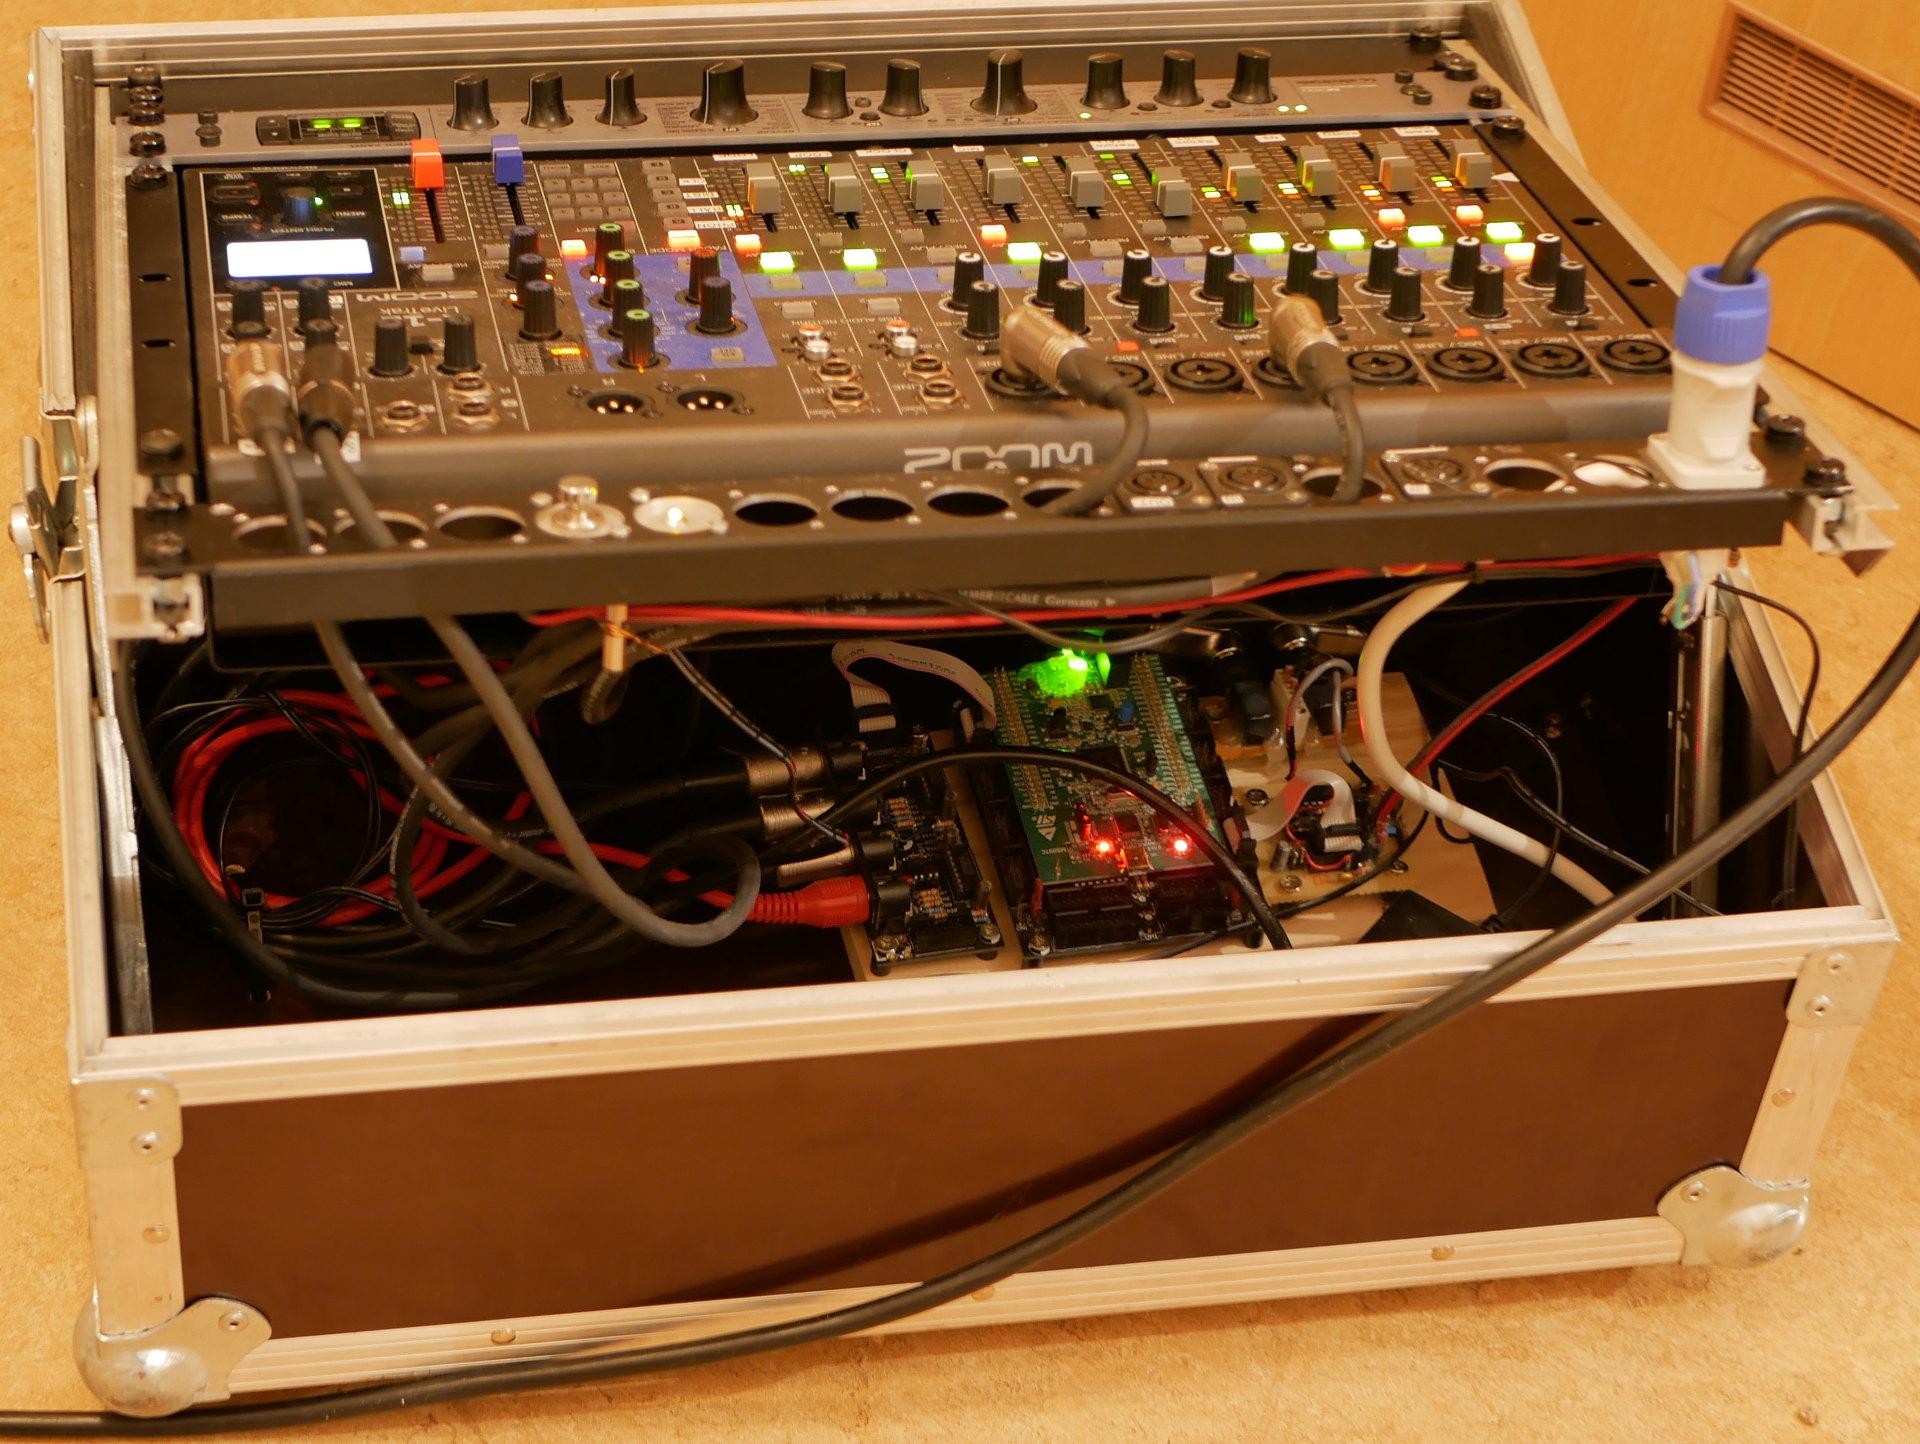 Midi Stream To Audio Converter Tape Recording Studio Wiring Clk2aclk L12 Rack Backthumb636cc35